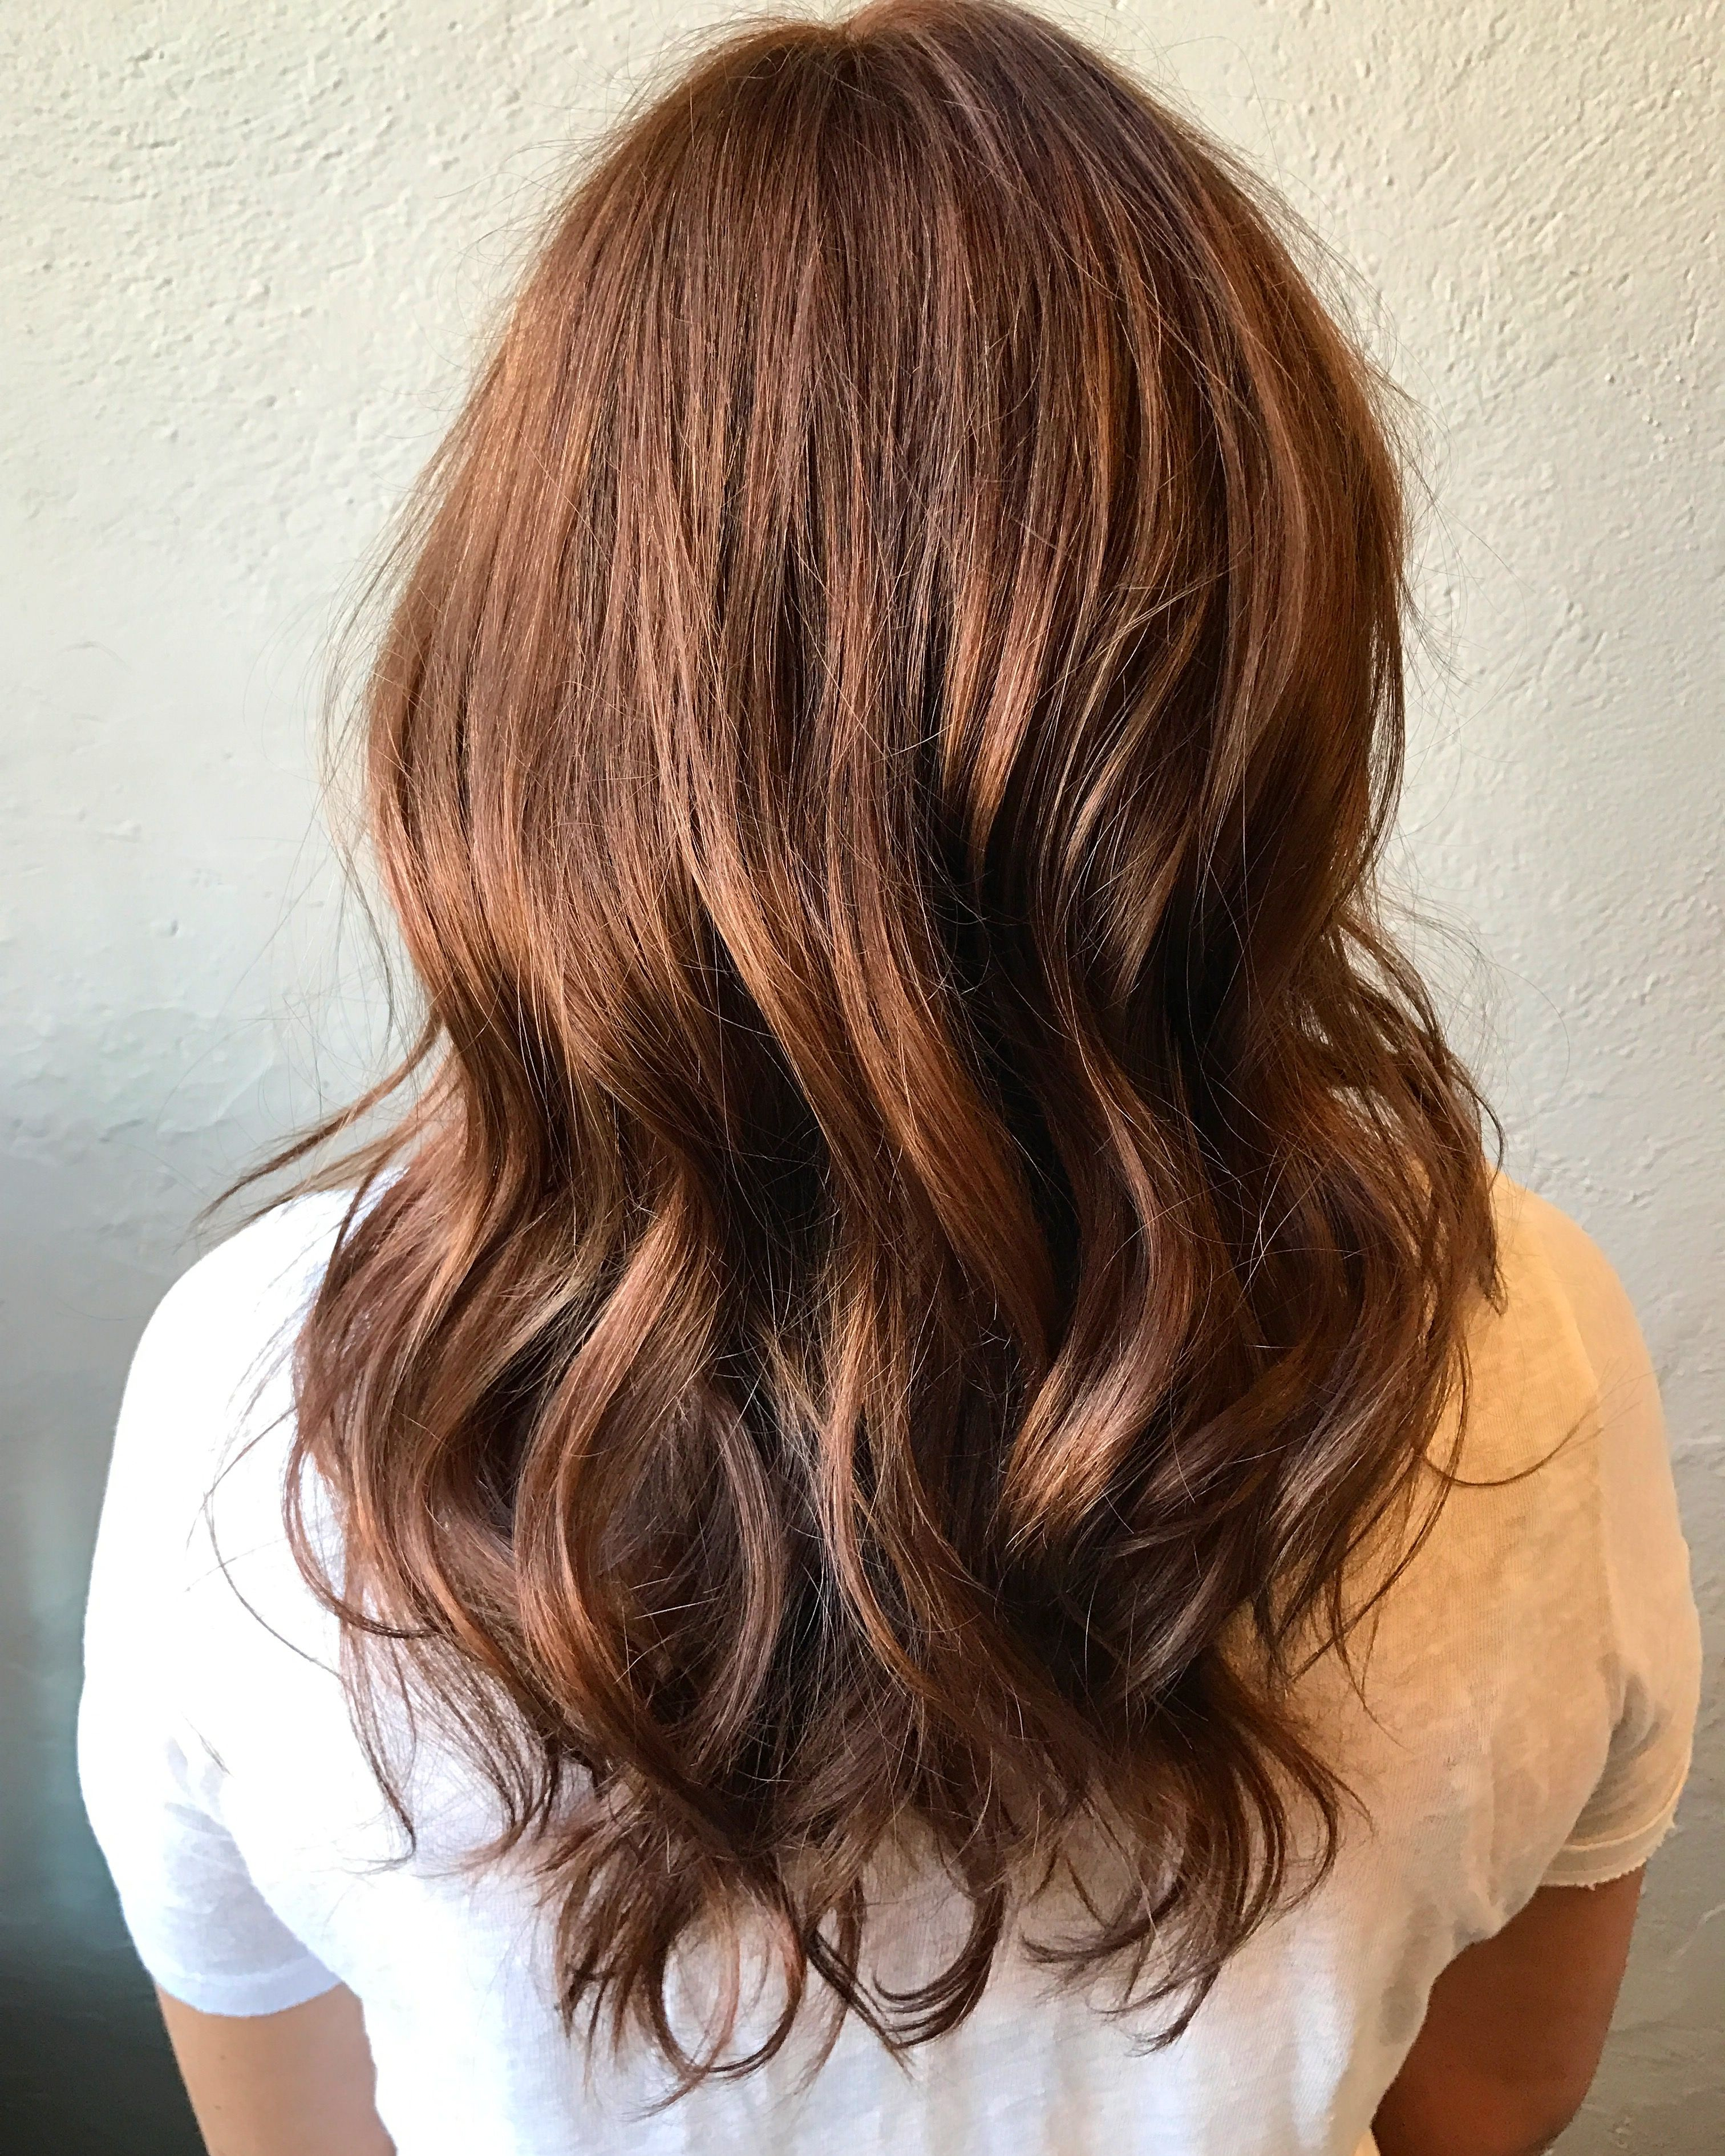 Nutmeg Chestnutbrown Fallhaircolor Cut And Style Salons Hair Color Lounges